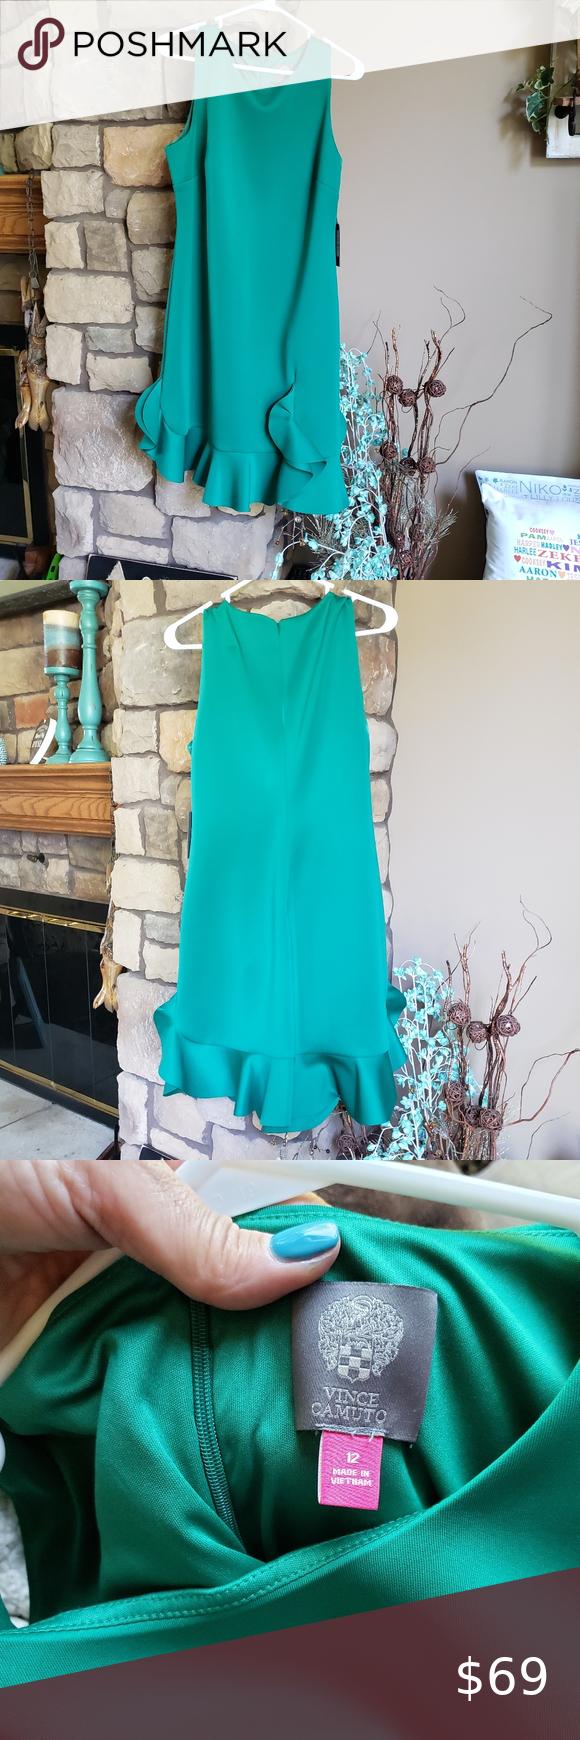 Vince Camuto Sz 12 Gorgeous Green Dress Nwt Green Dress Clothes Design Colorful Dresses [ 1740 x 580 Pixel ]